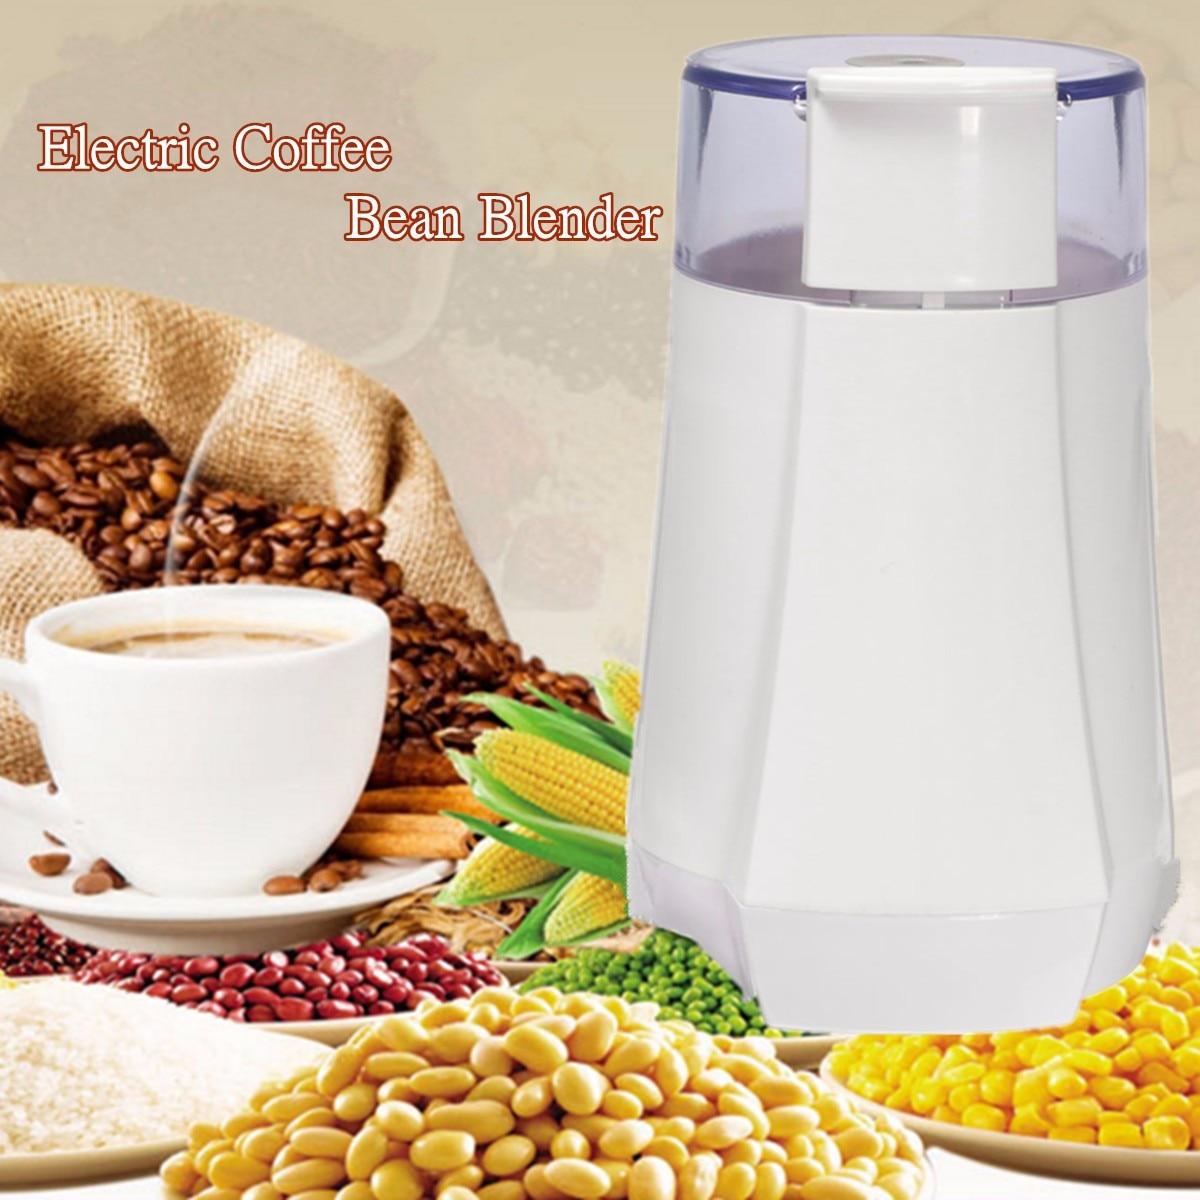 80W 220-240V Stainless Steel Coffee Grinder Electric Coffee Bean/Herbs/Spices/Nuts/Grains Grinding Machine Blade Grinder